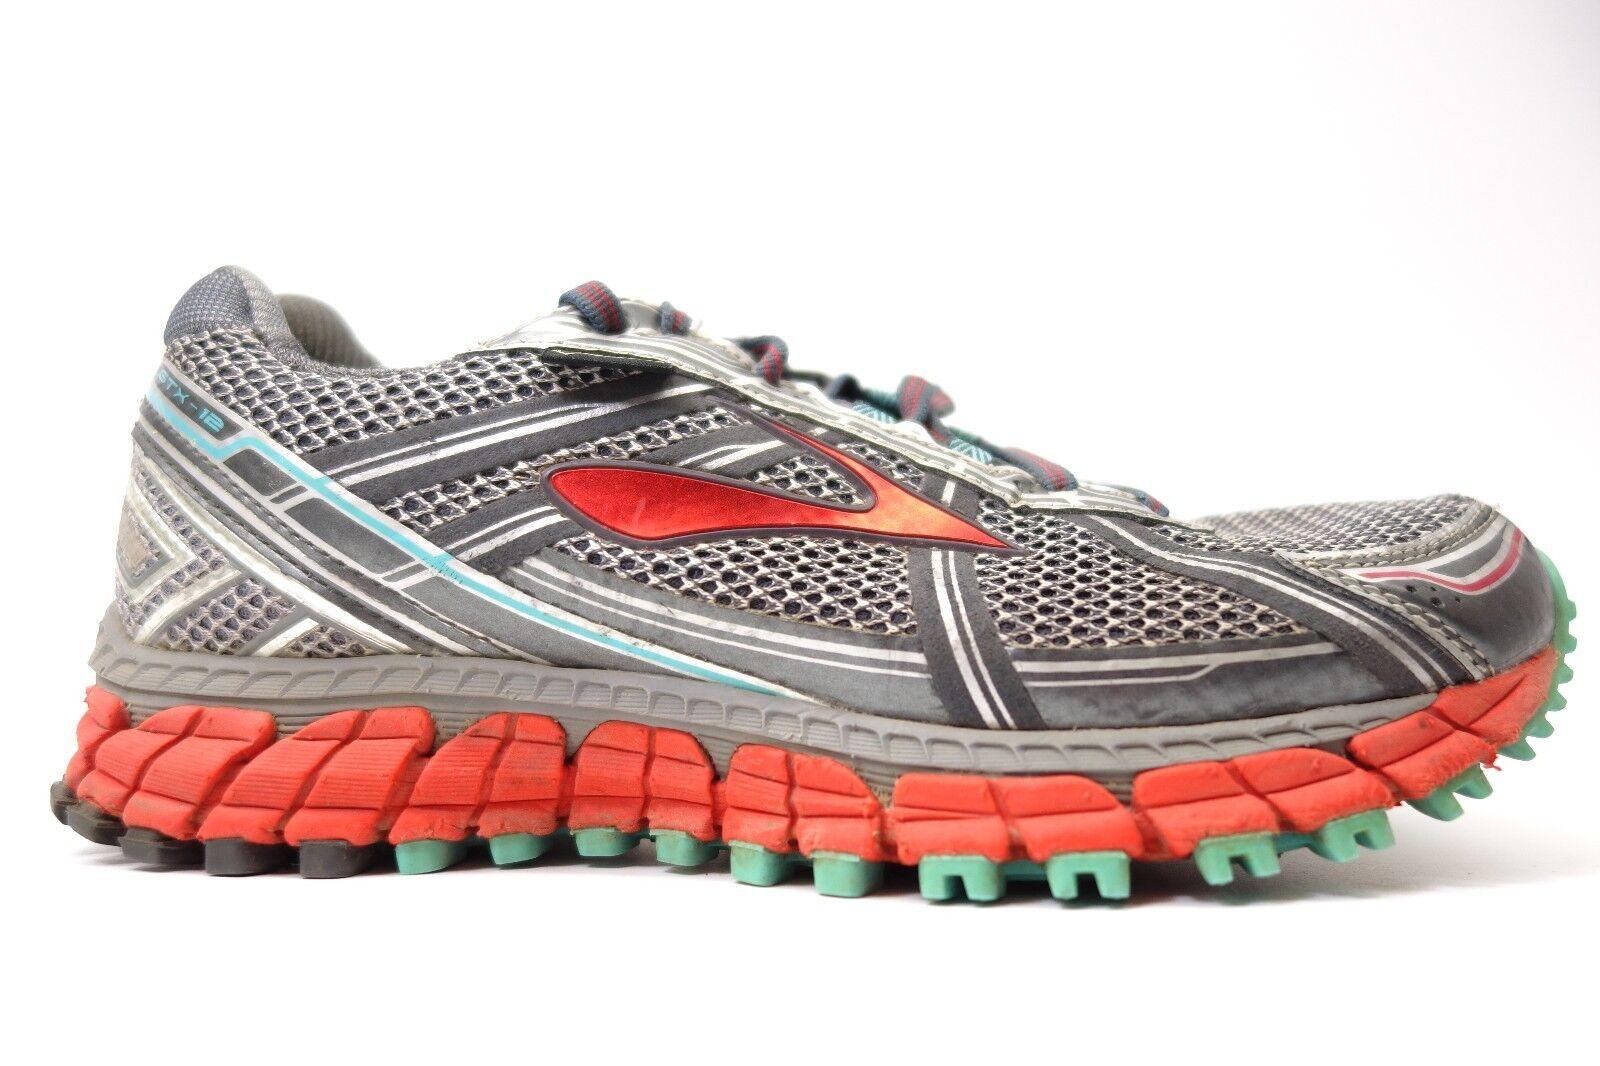 Brooks donna  Adrenaline ASR 12 GTX Waterrepous Running Athletic scarpe Dimensione 7.5  autentico